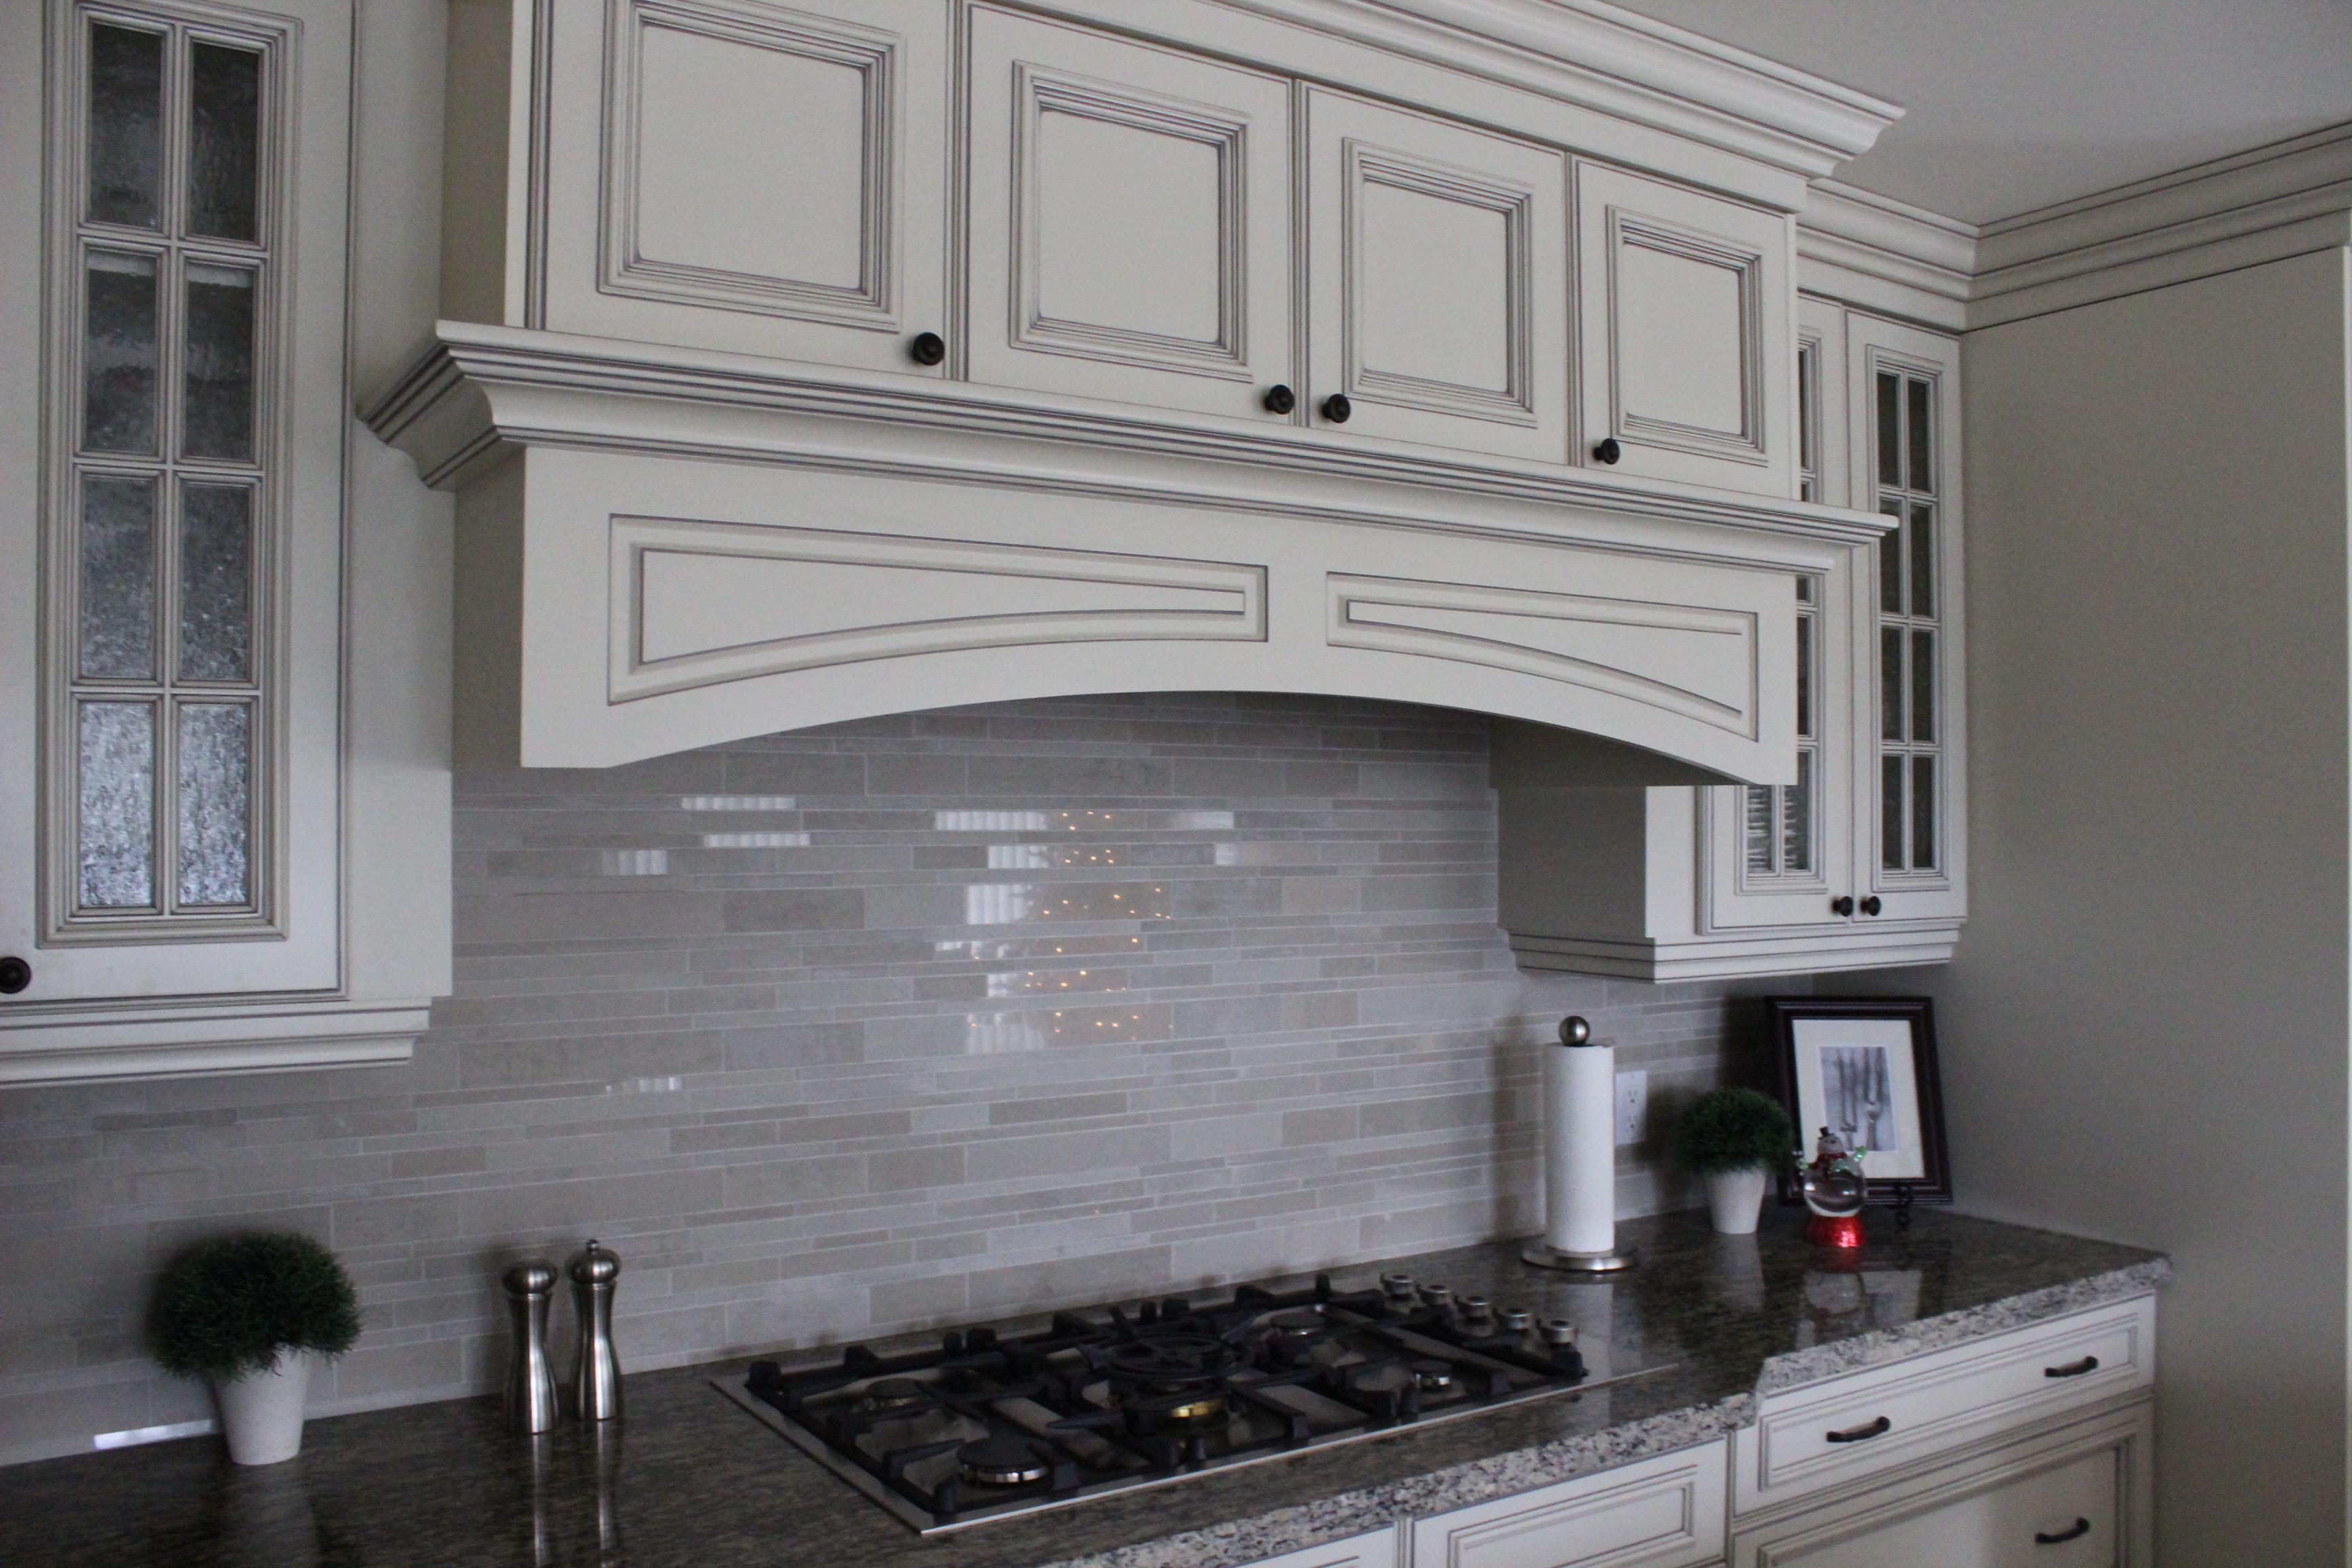 This Kitchen Features Kitchen Craft S Wellington Doorstyle In Maple Seashell With Pewter Glaze Http Www Kitchen Crafts Beautiful Kitchen Cabinets Kitchen